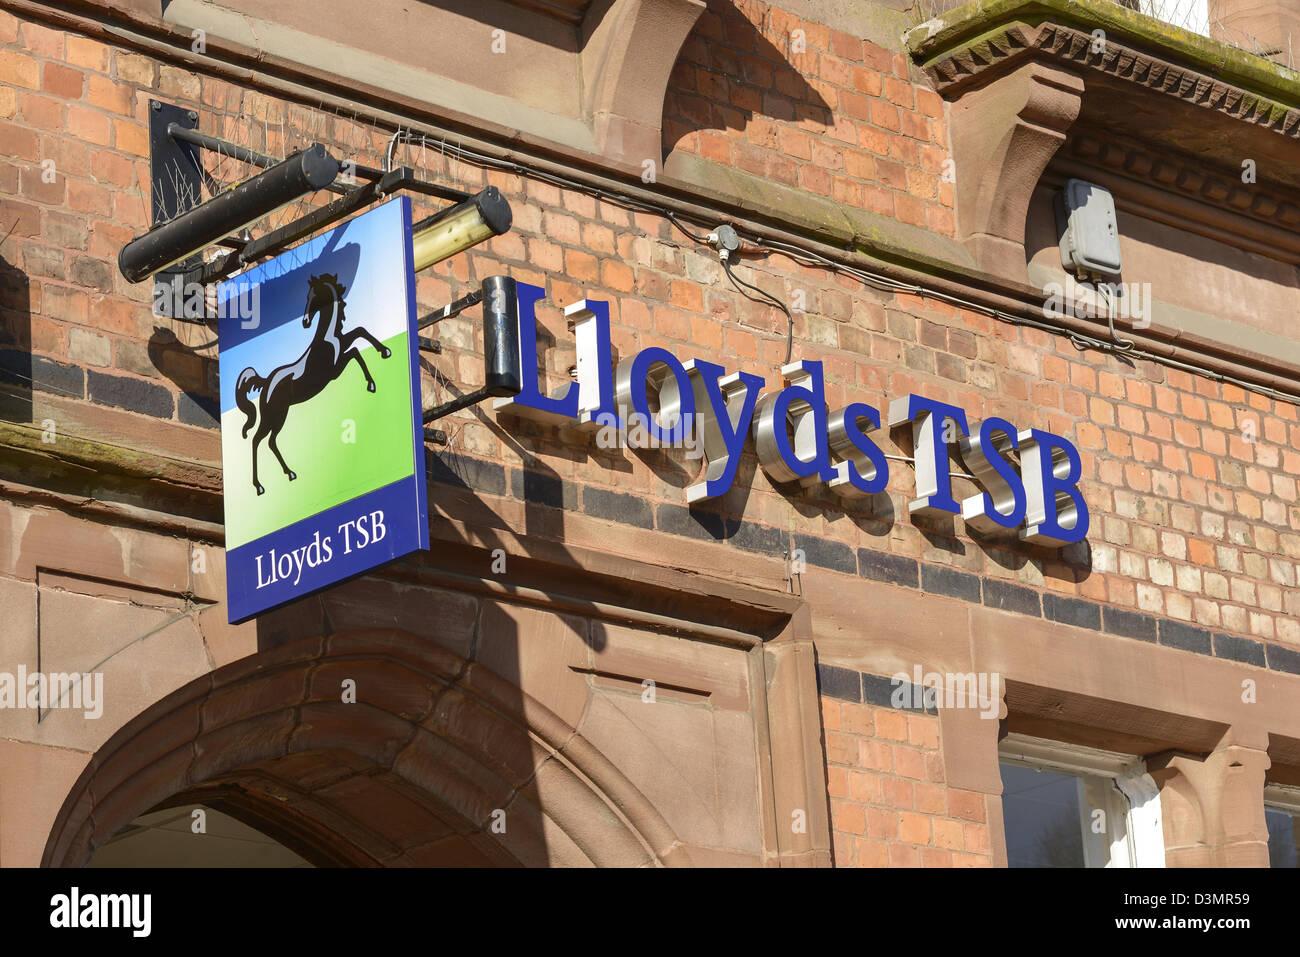 Lloyds TSB Bank sign - Stock Image